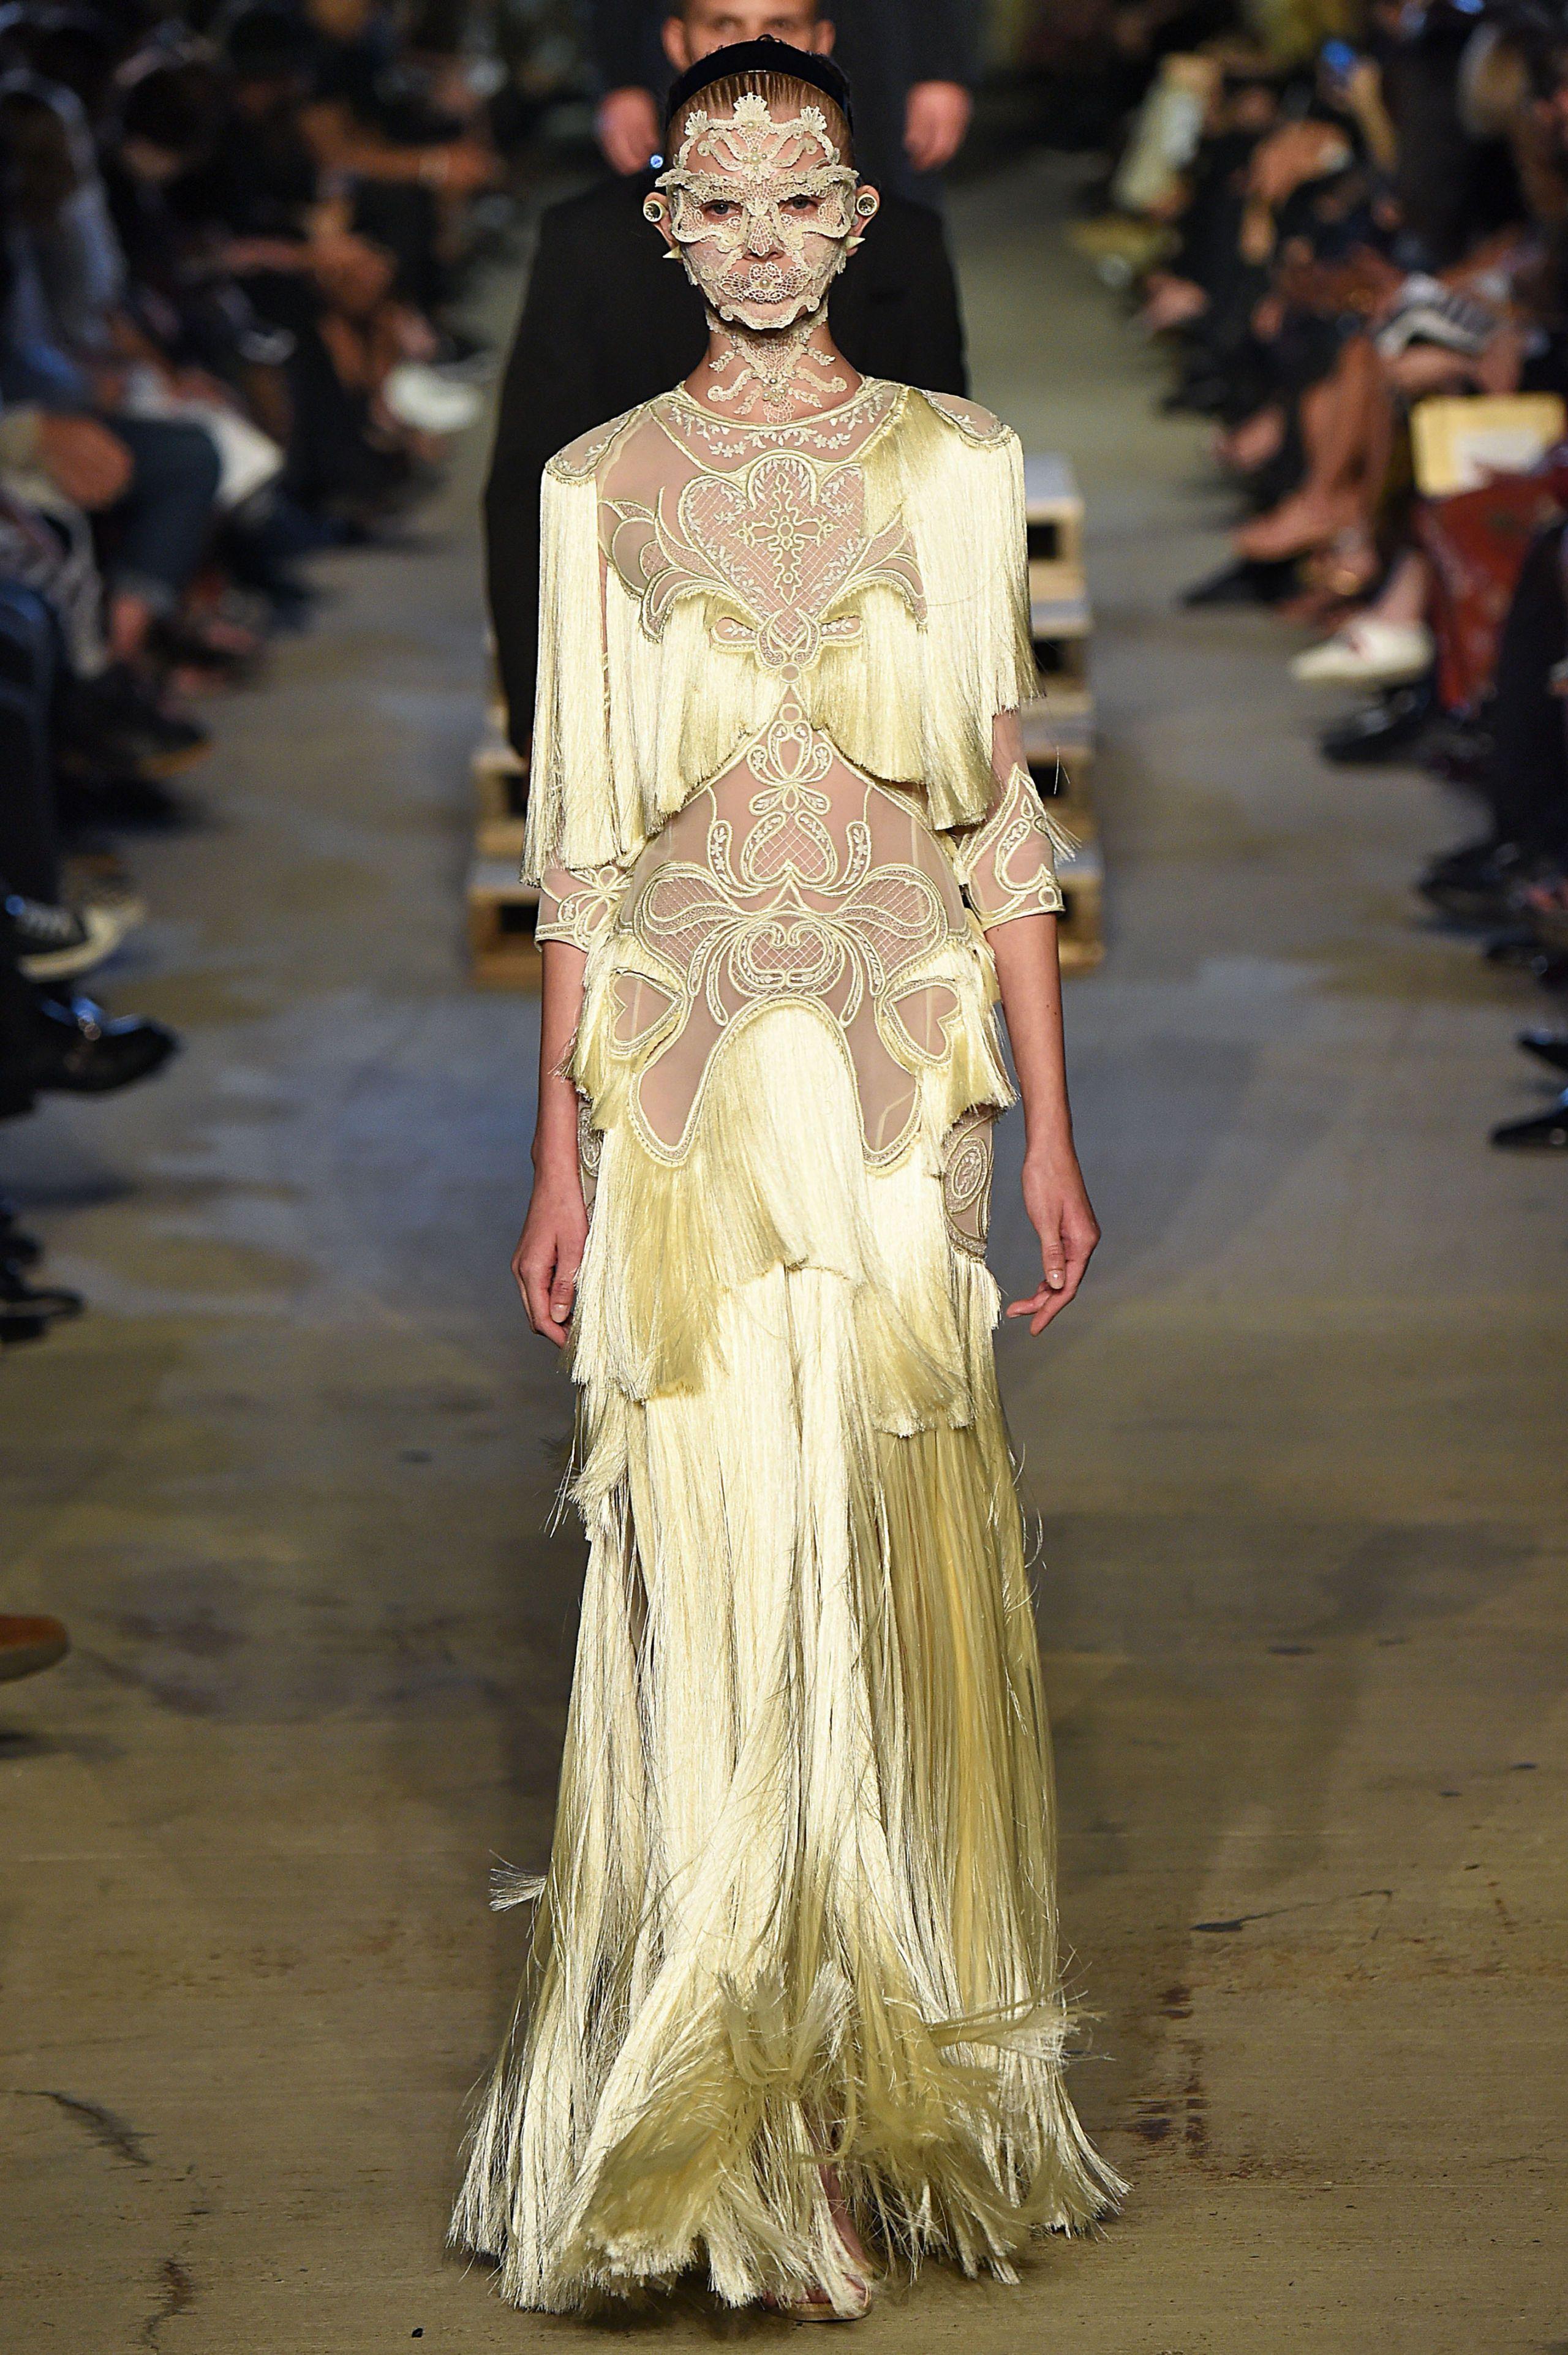 Beatiful Dresses Fashion Show